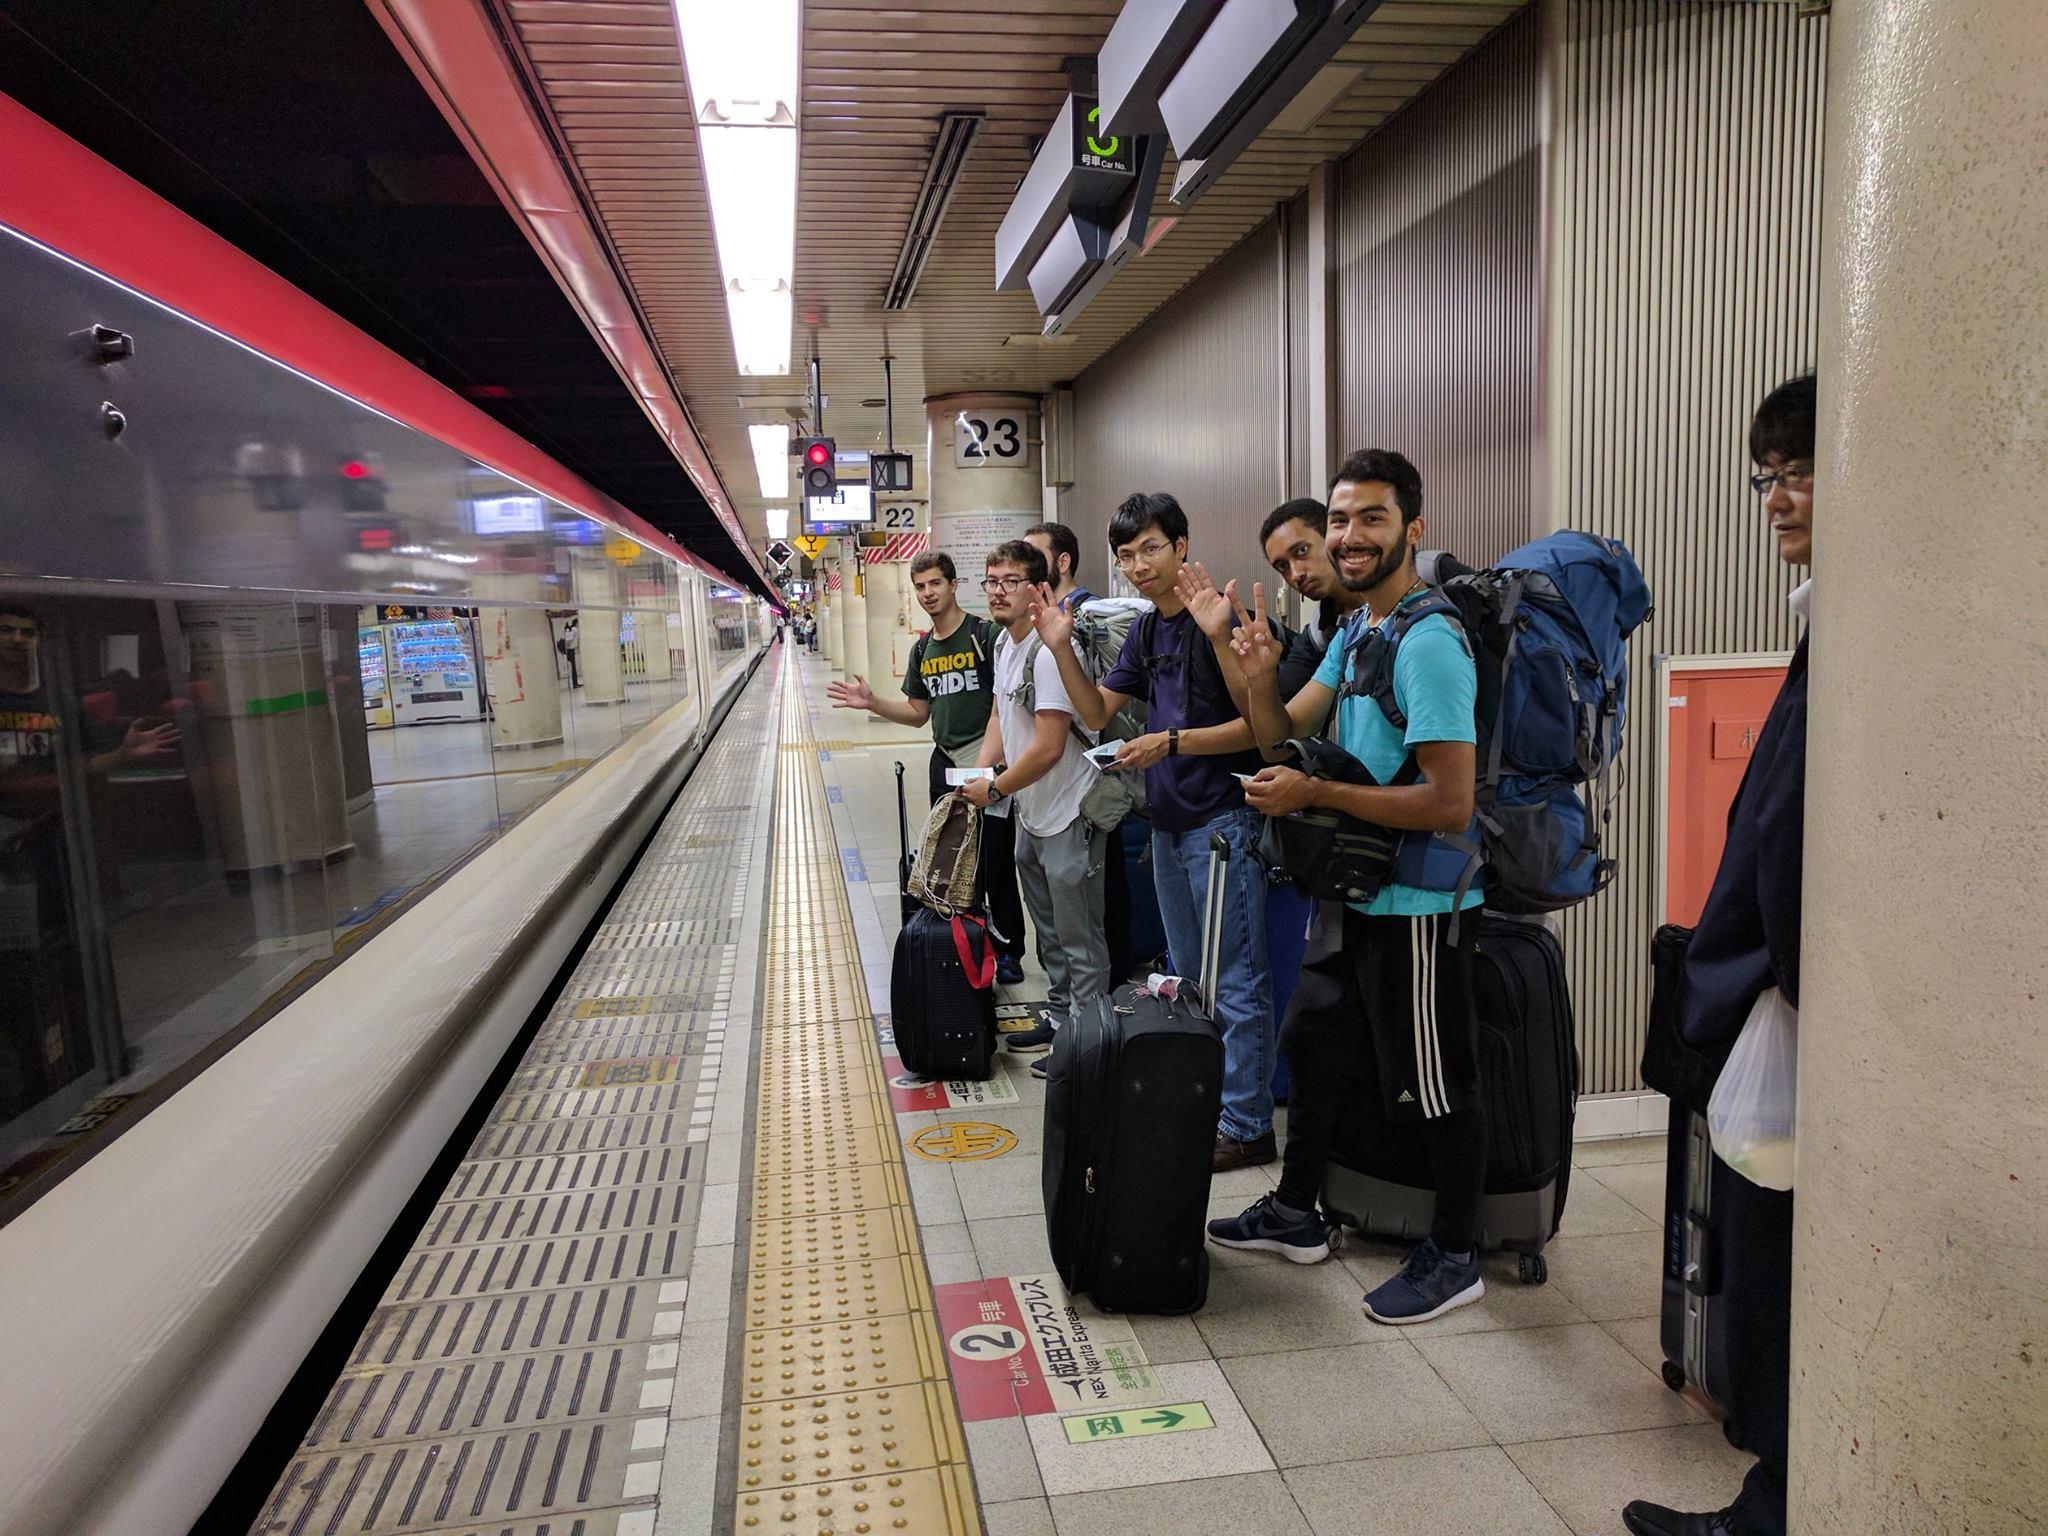 Competing in the Amazon Robotics Challenge in Nagoya, Japan